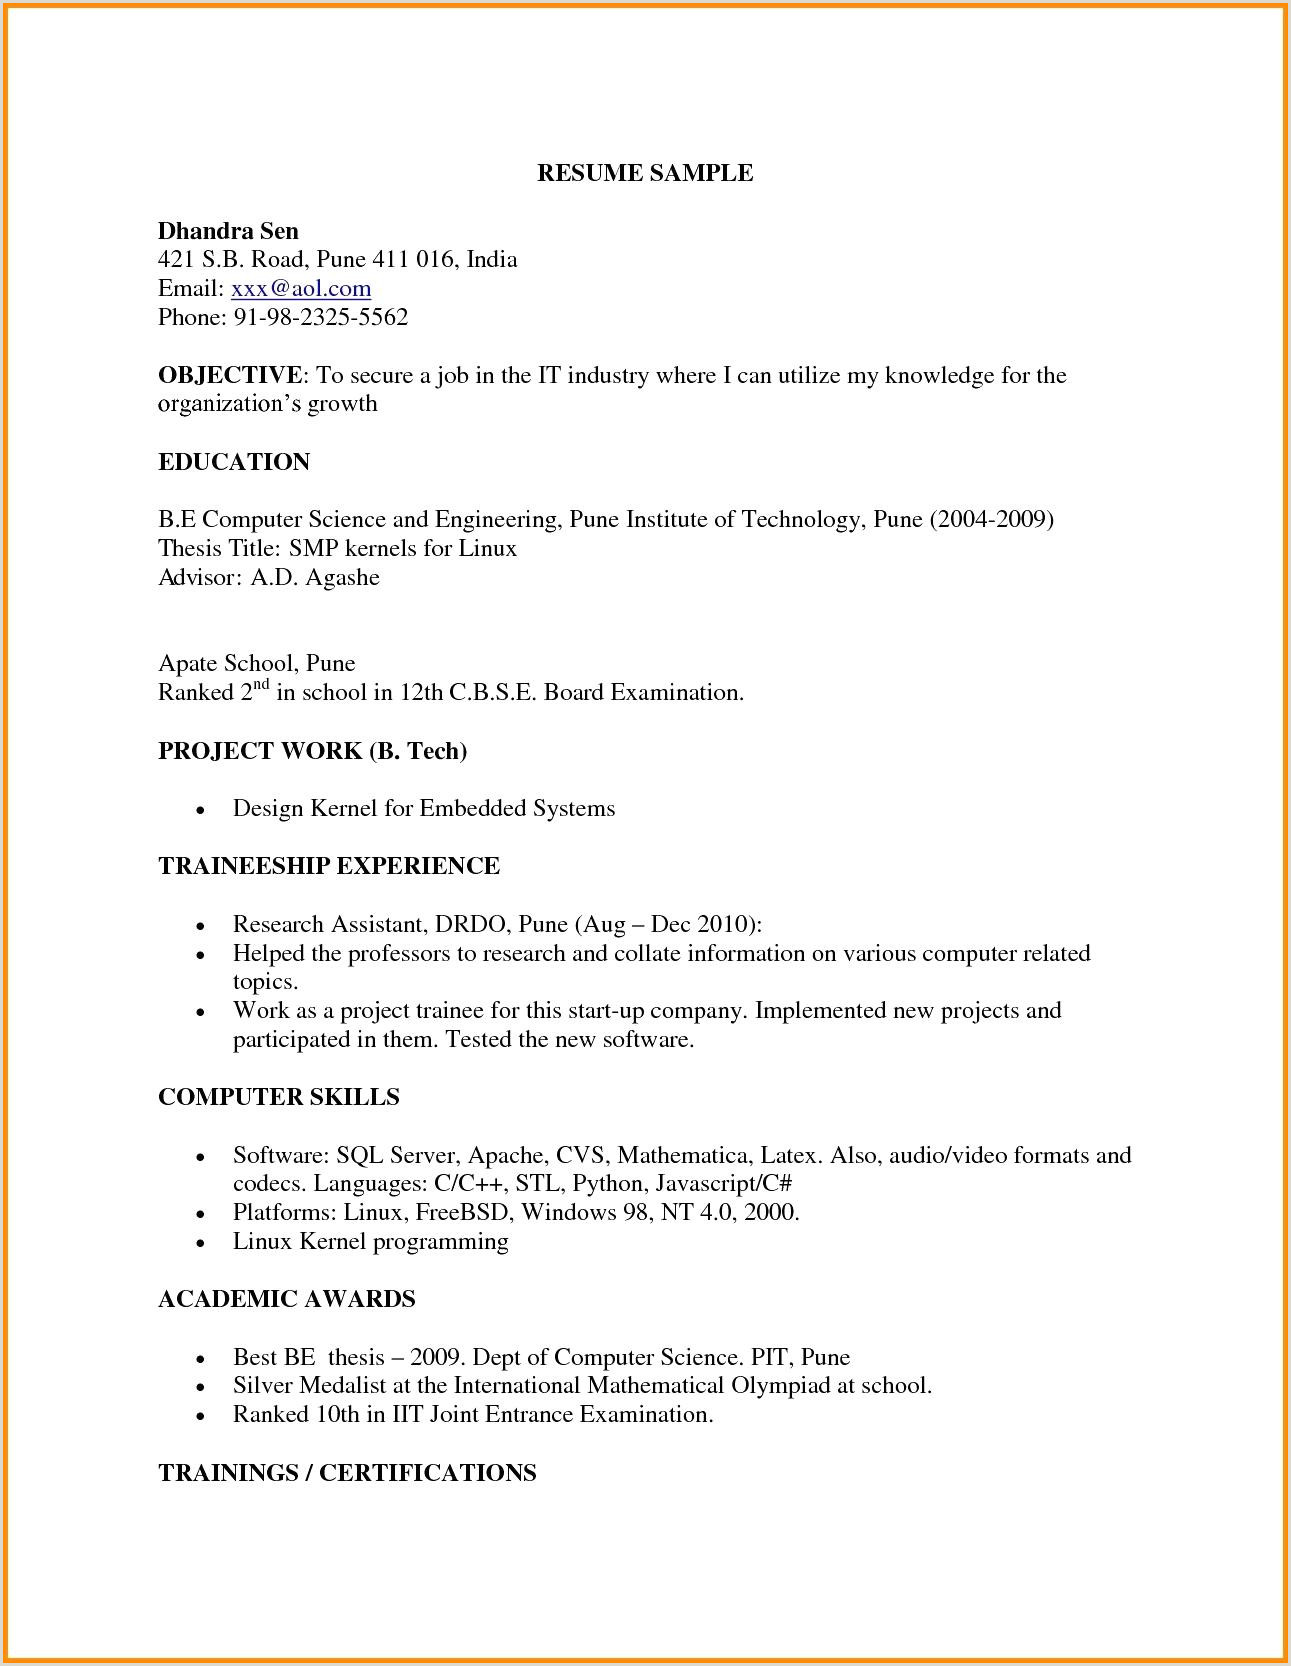 Fresher Resume Format For B.tech Cse Beautiful Fresher Resume For Mechanical Engineer